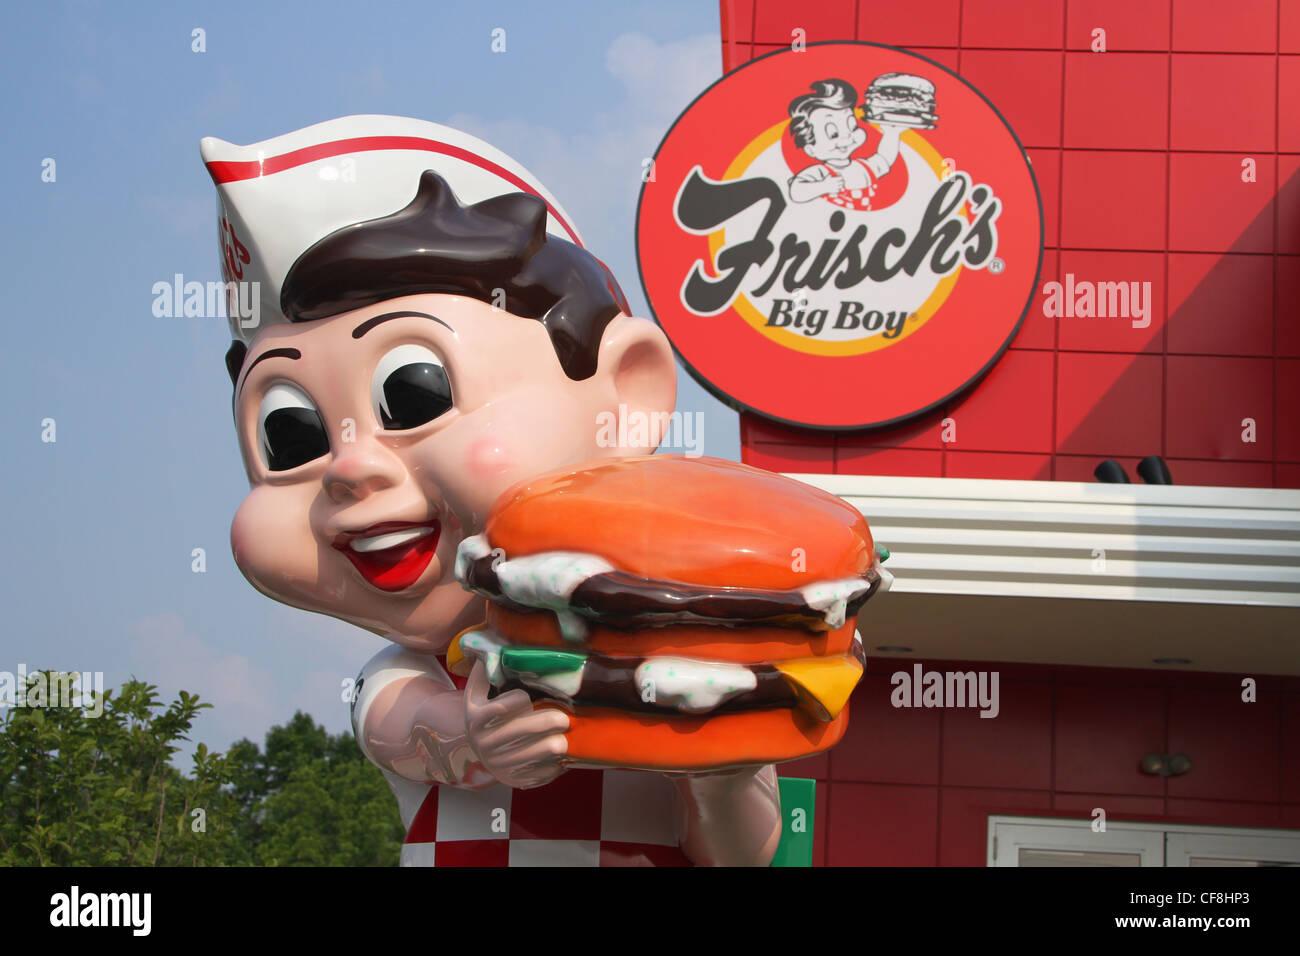 Big Boy Burger Fotos E Imagenes De Stock Alamy Everyday till as late as they'll let us. https www alamy es foto big boy mascota o el icono de big boy restaurantes frischs big boy restaurante beavercreek dayton ohio ee uu 43830139 html